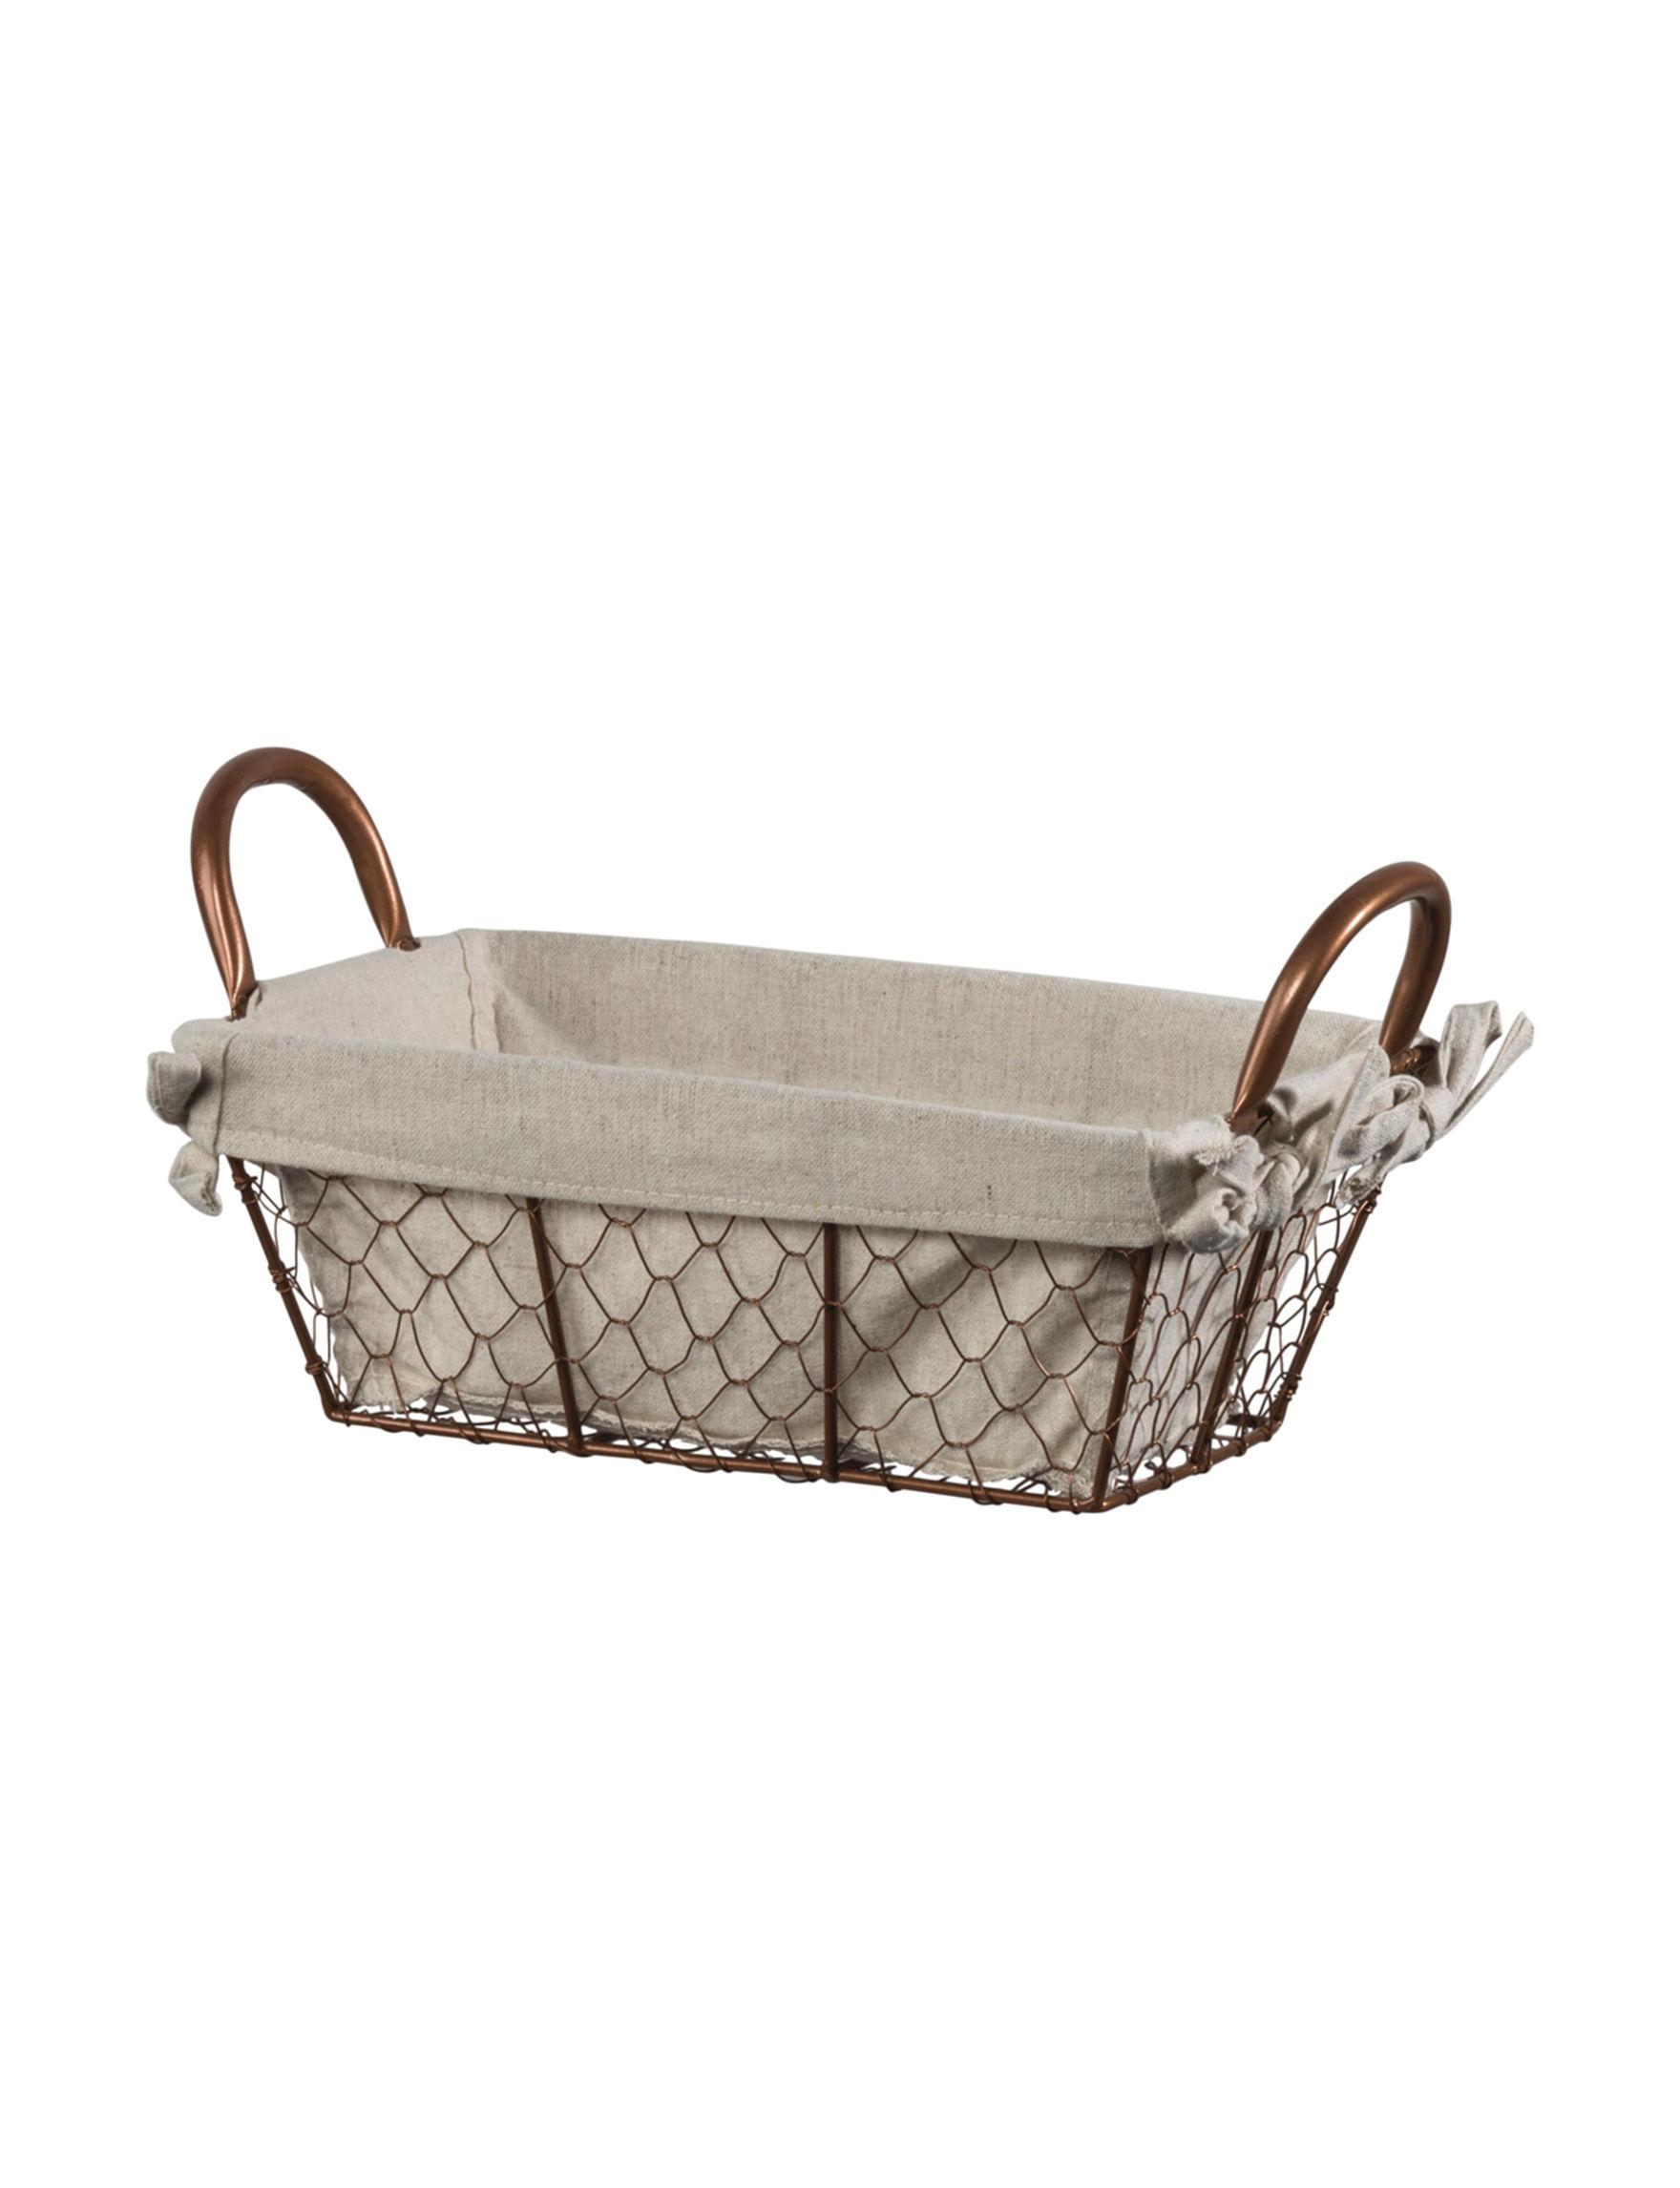 A&B Home  Baskets Storage & Organization